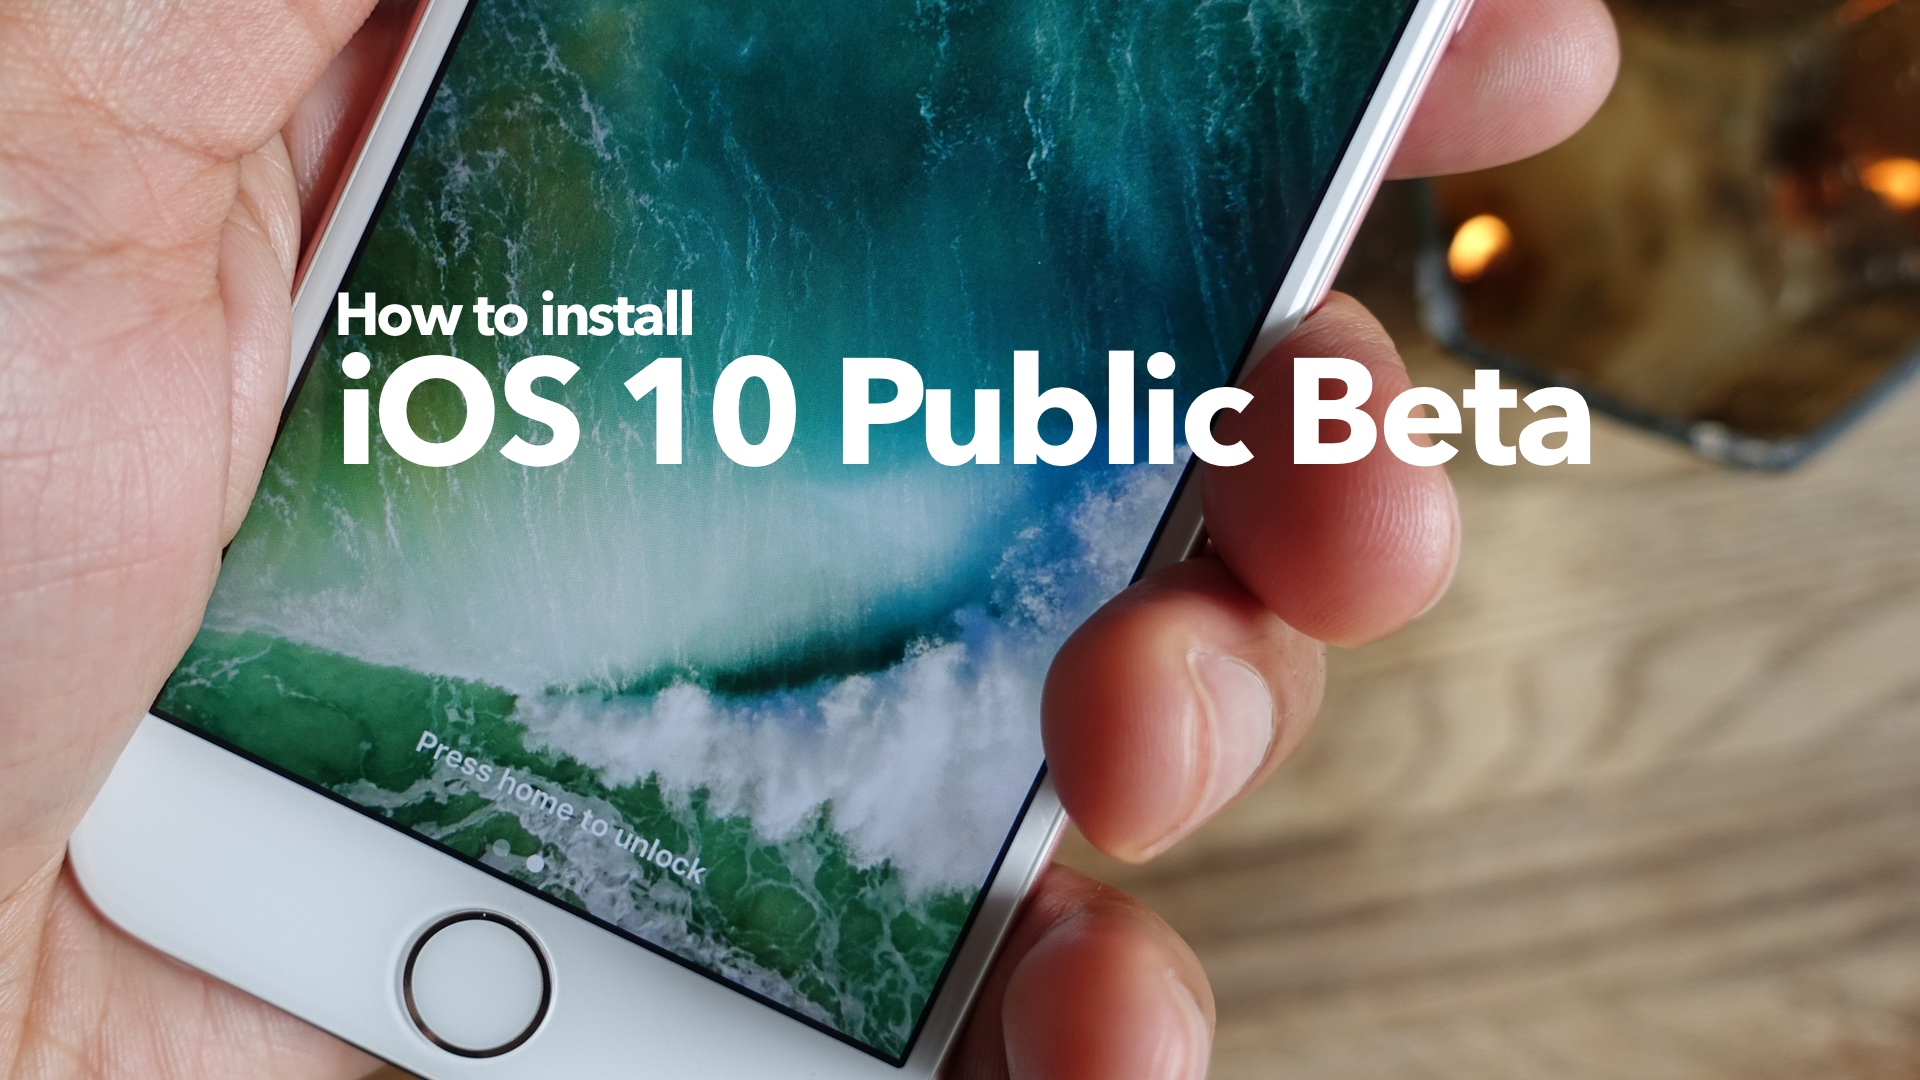 How to install public beta